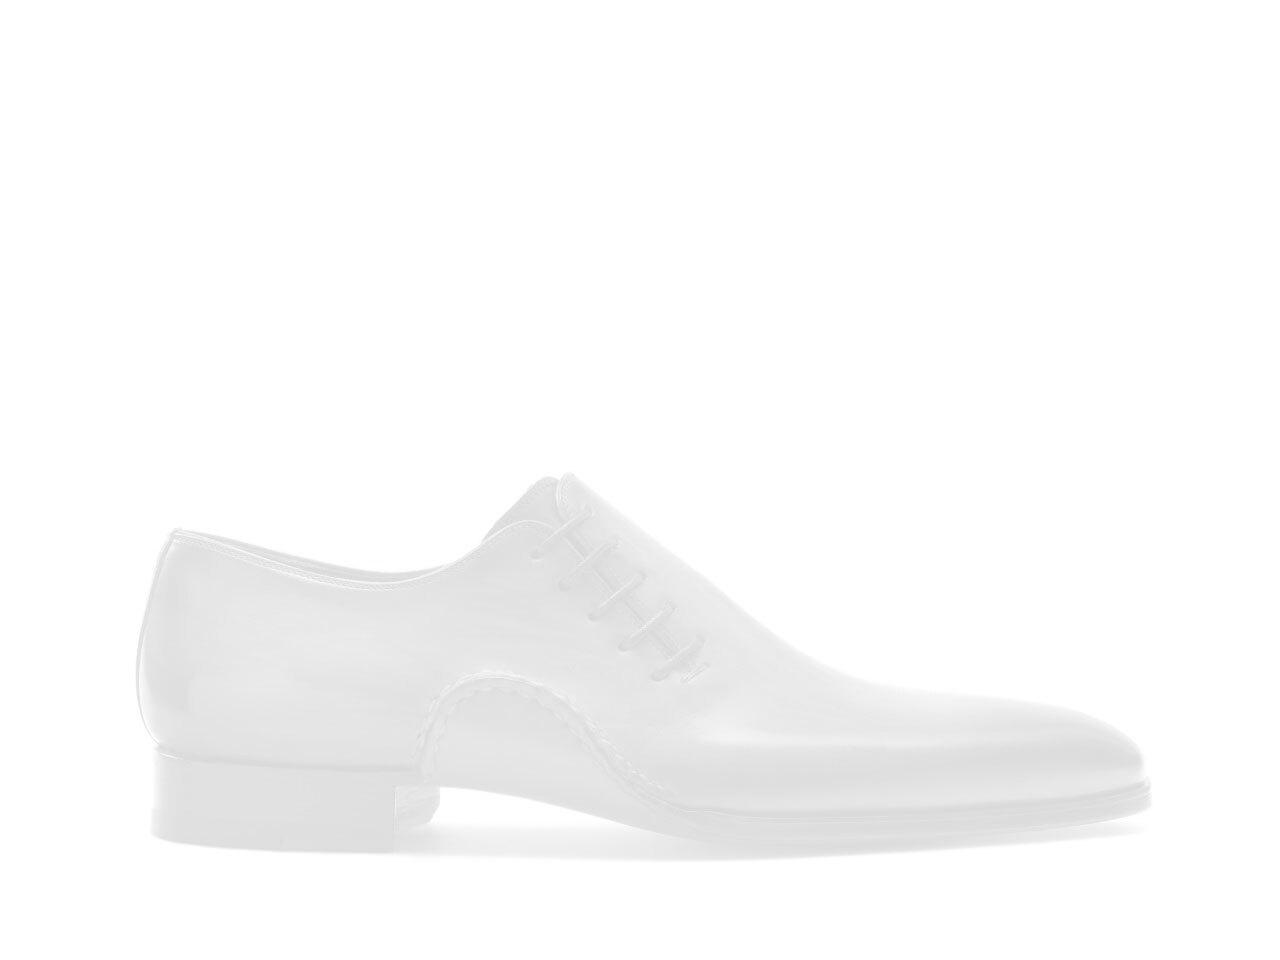 Pair of the Magnanni Montijo Cognac Men's Driving Shoes